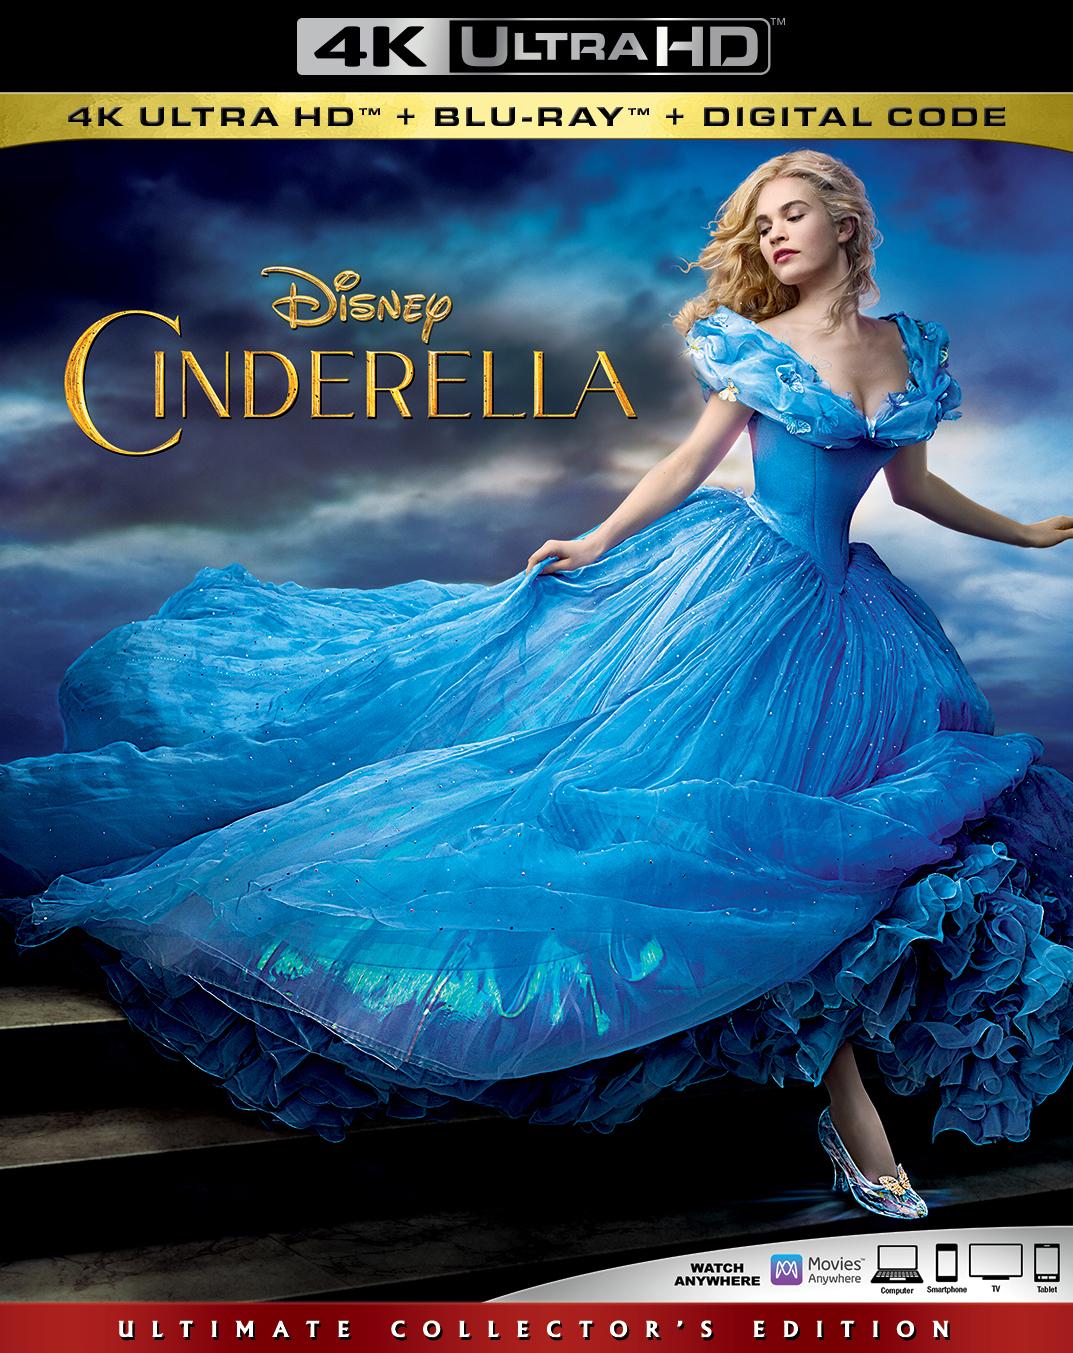 Cinderella (Live Action)(4K Ultra HD Blu-ray)(Pre-order / TBA)